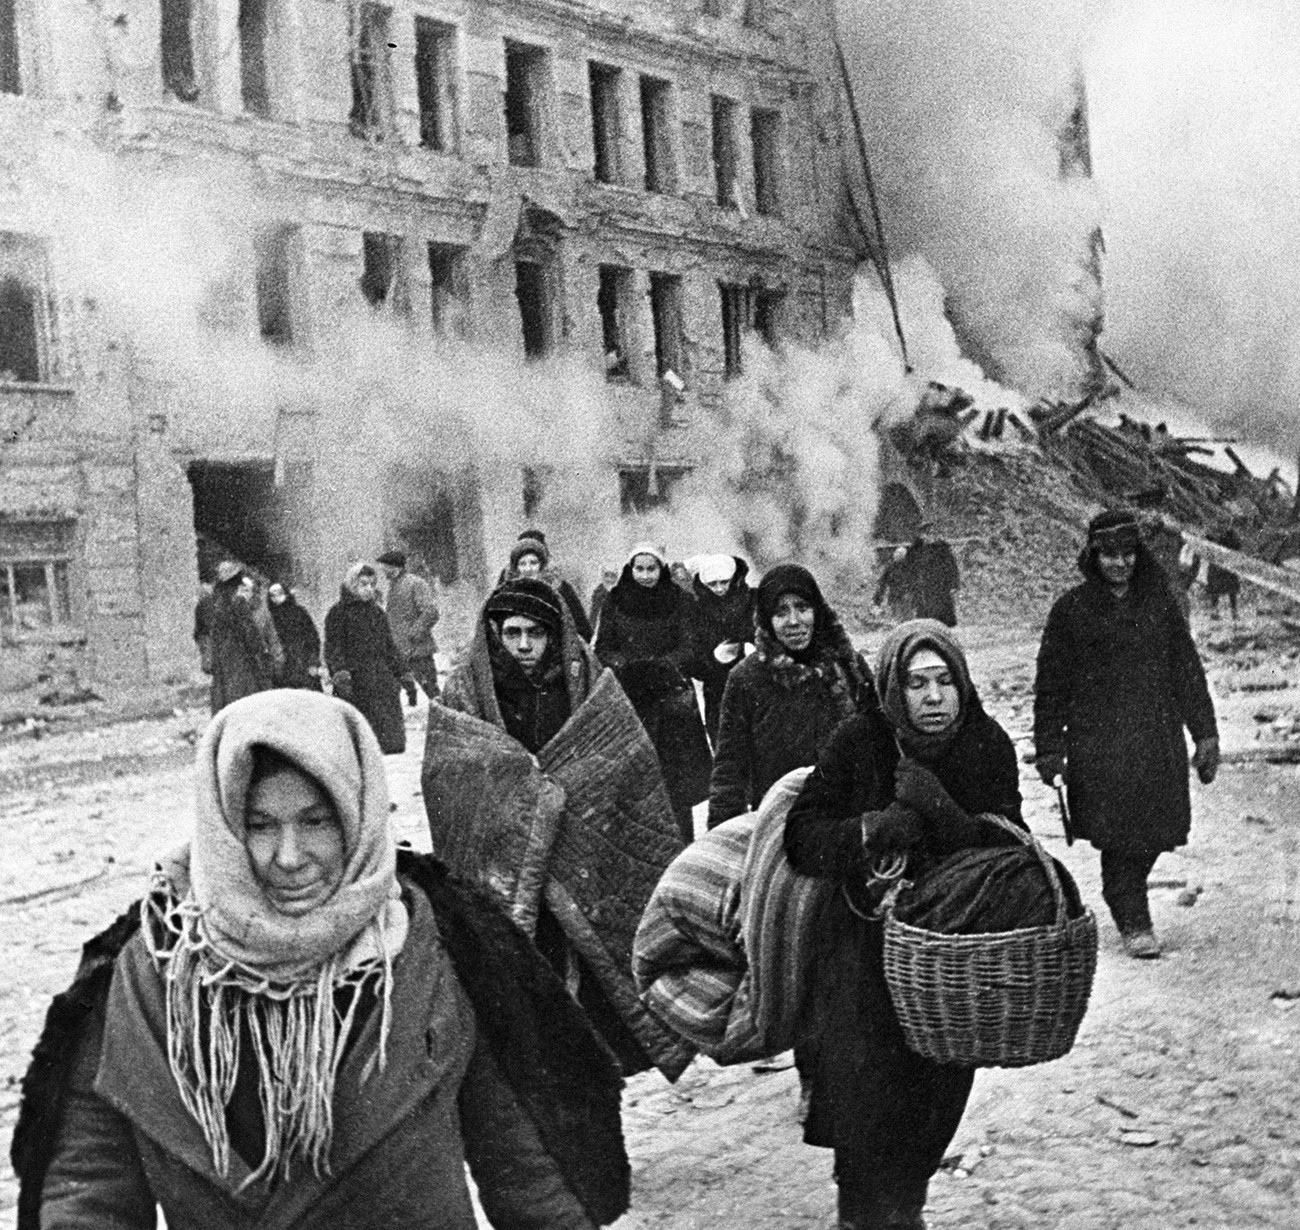 Civilisti v Leningradu med obleganjem mesta (1941 - 1943)